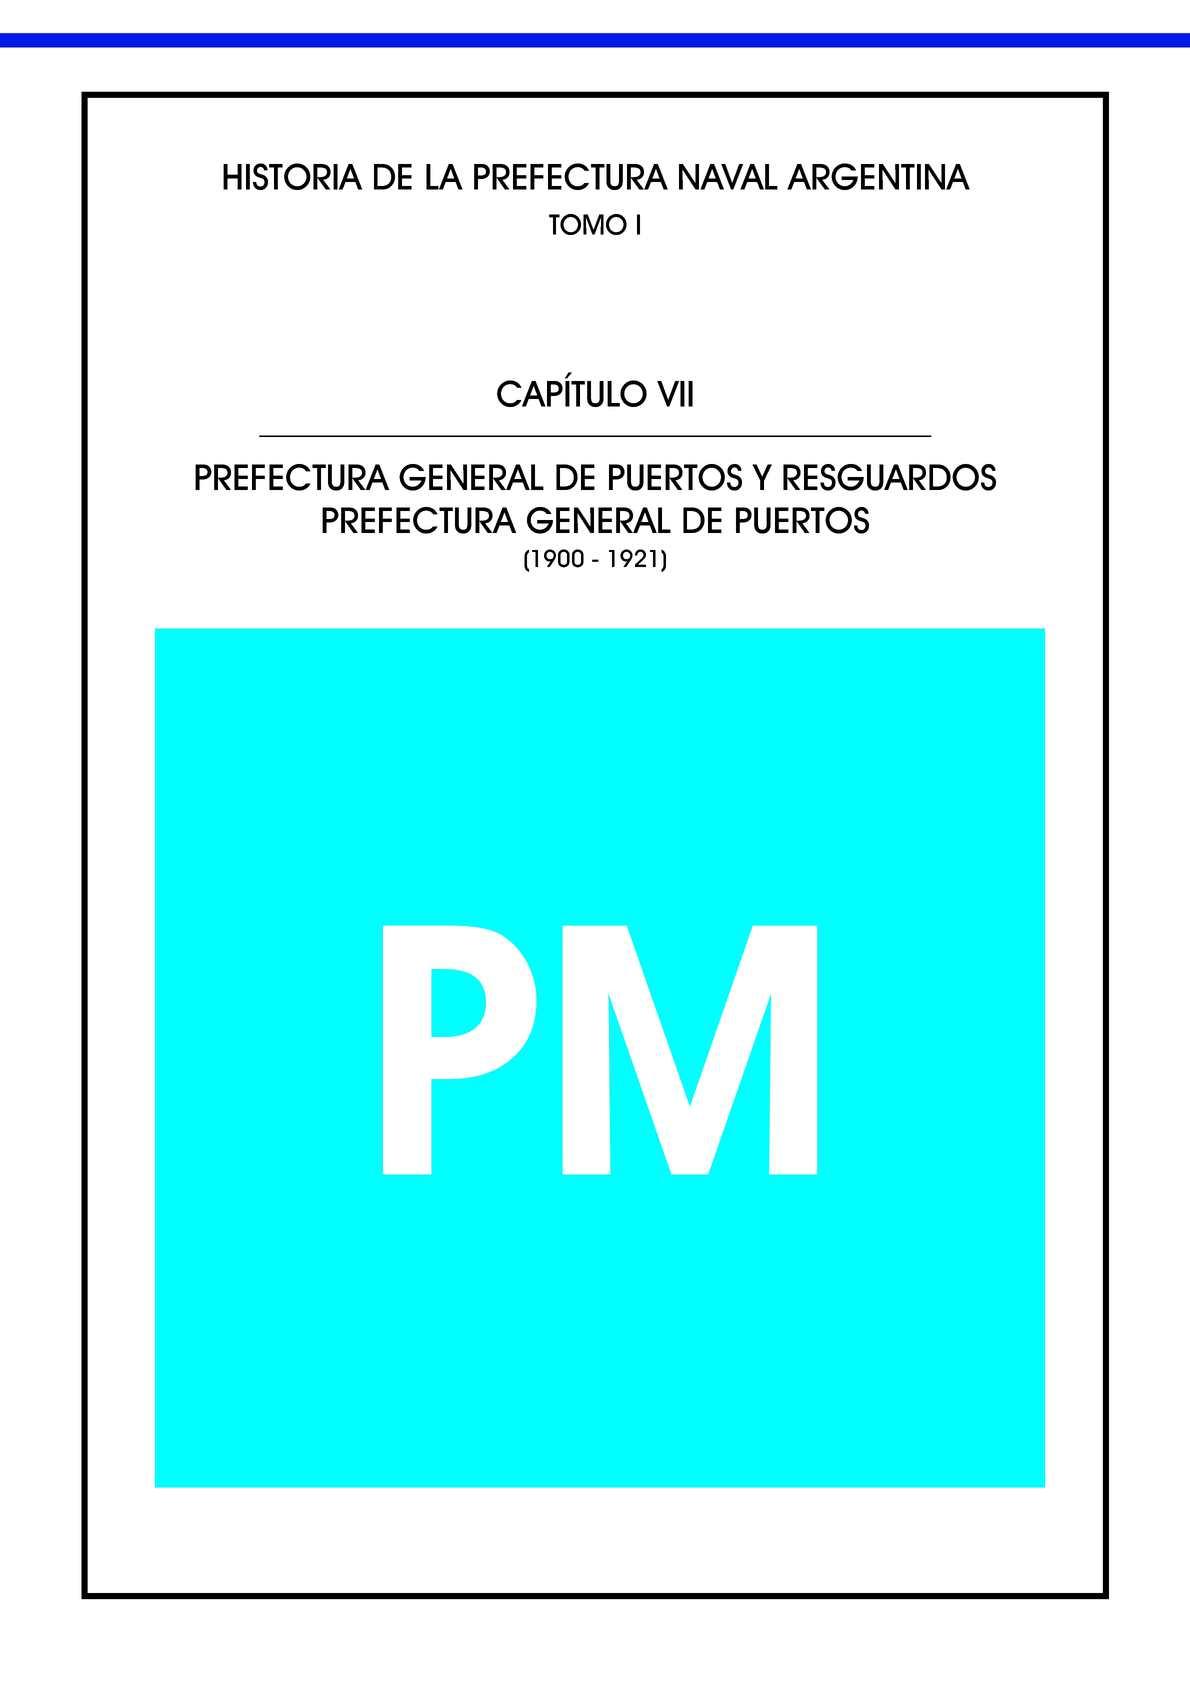 Calaméo - Historia_PNA_Tomo_1_Primera_Parte_II